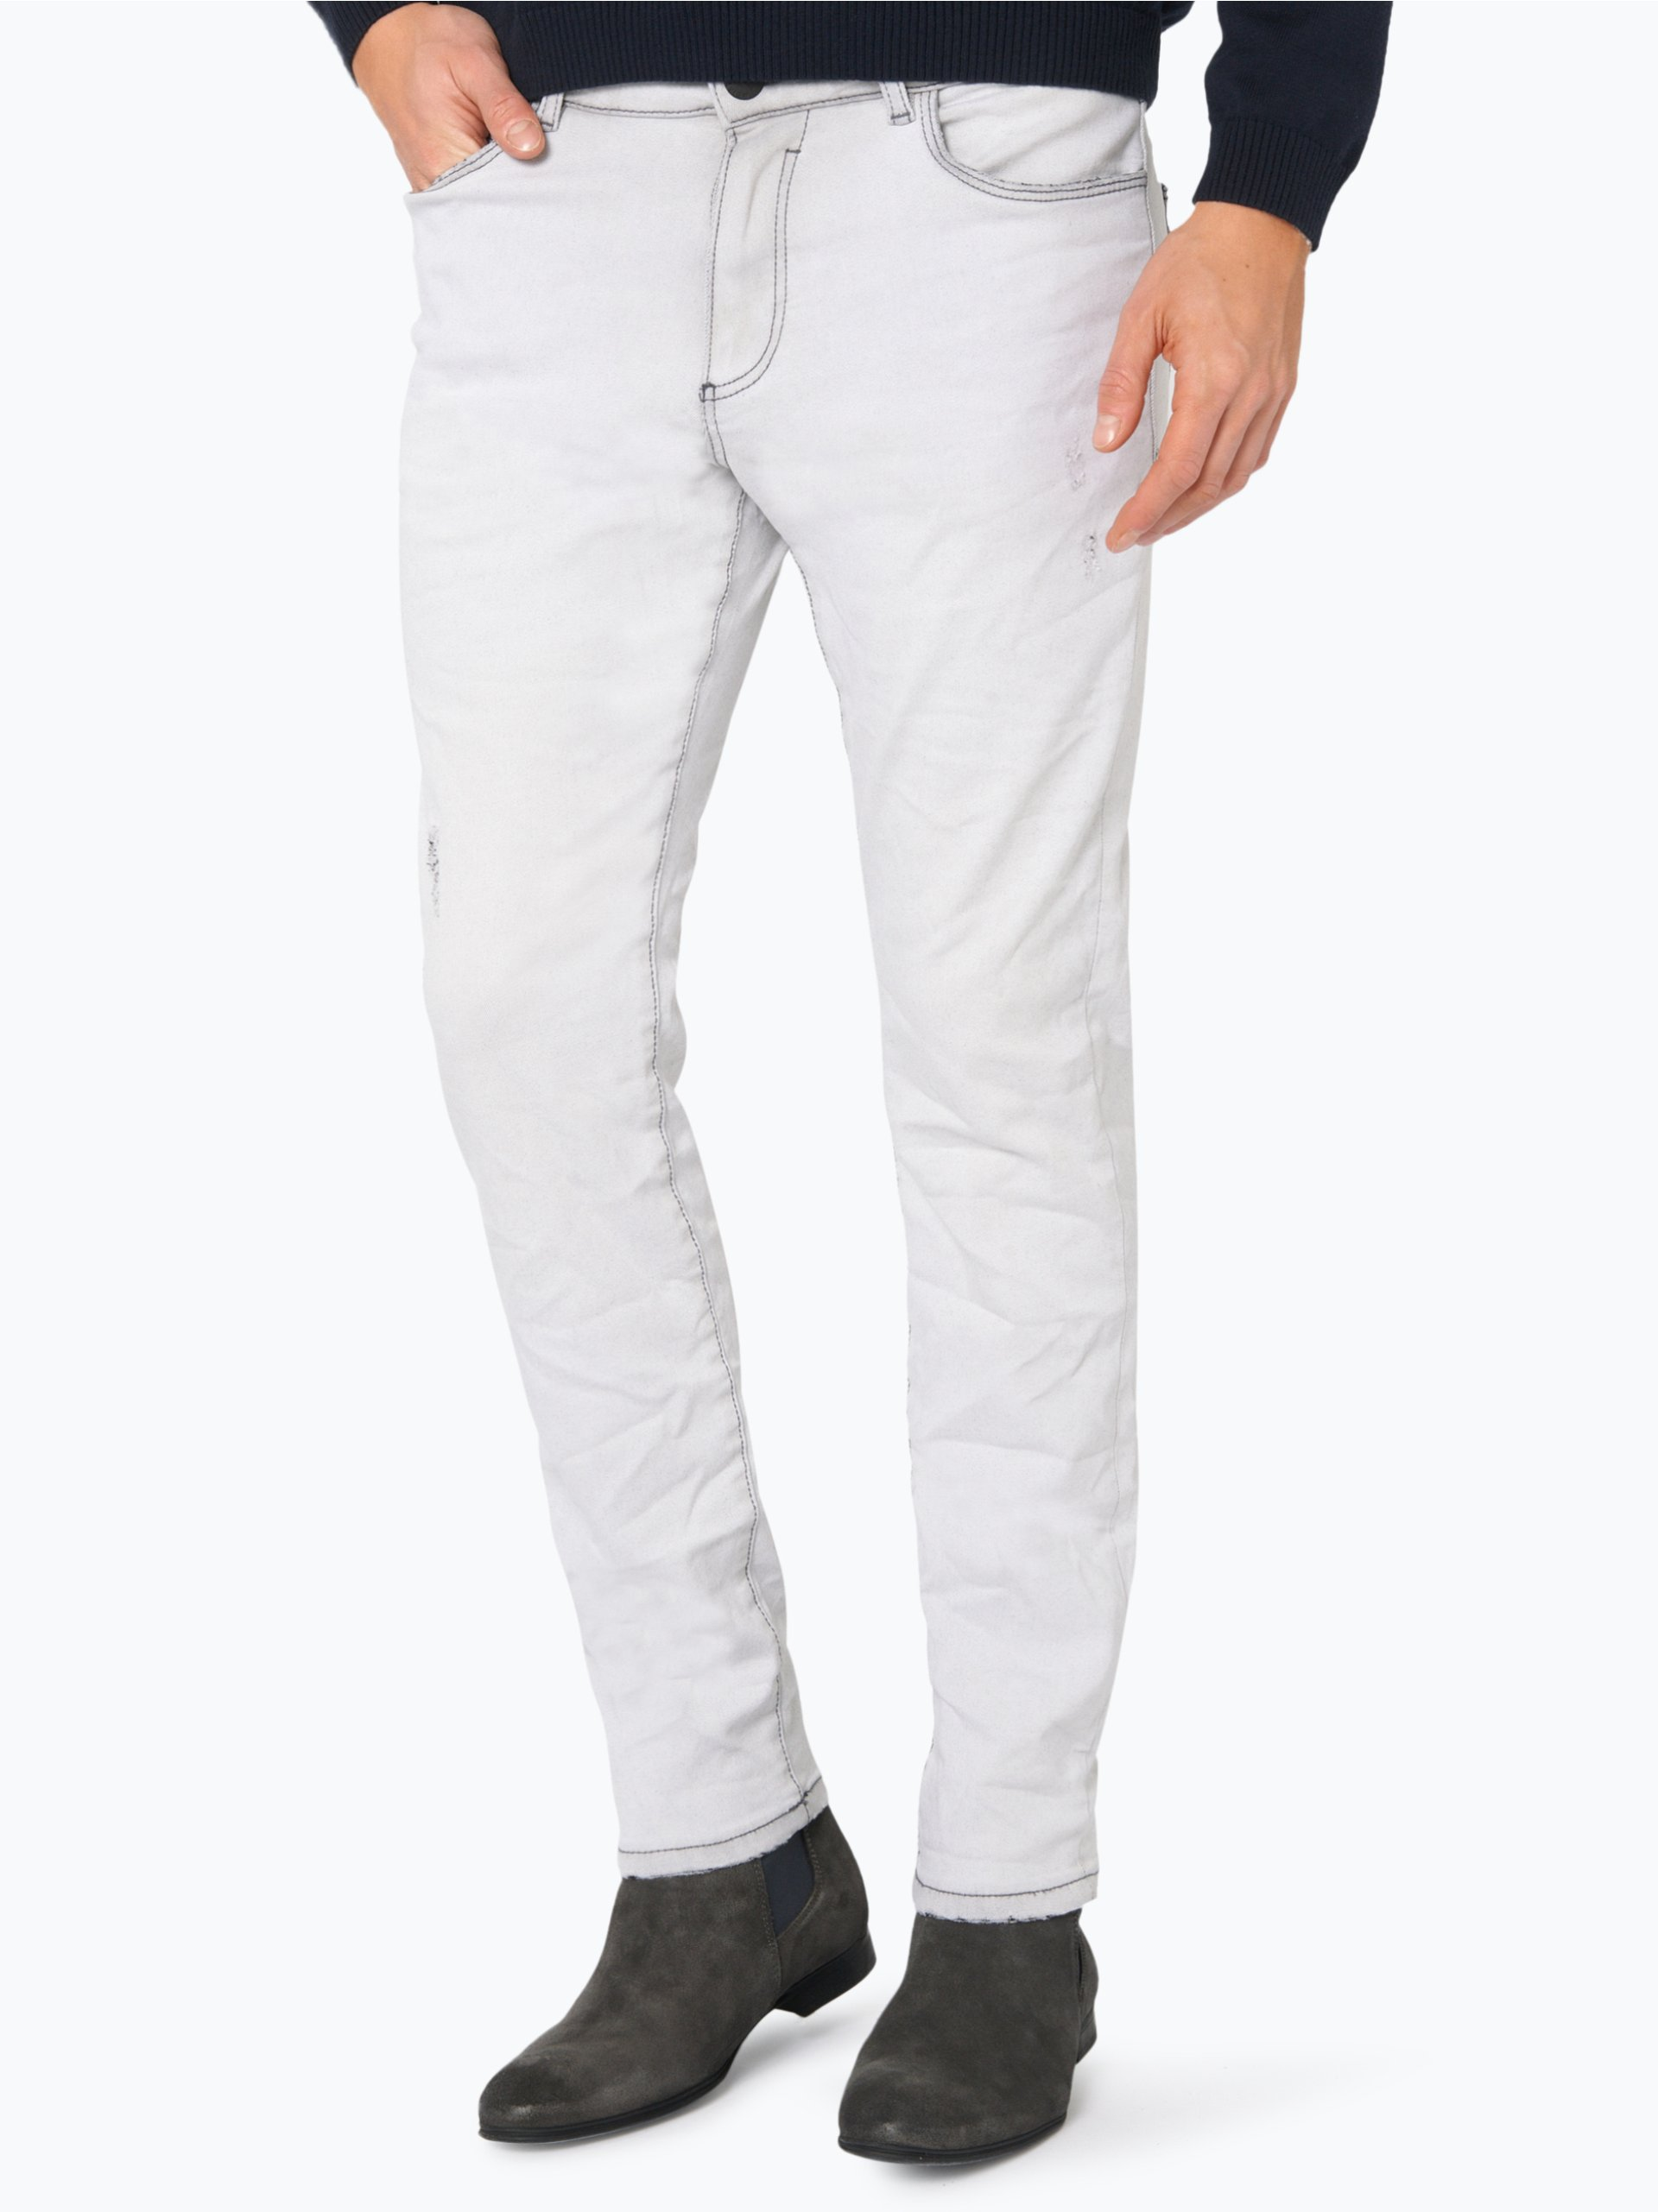 review herren jeans jeremy skinny wei uni online kaufen vangraaf com. Black Bedroom Furniture Sets. Home Design Ideas